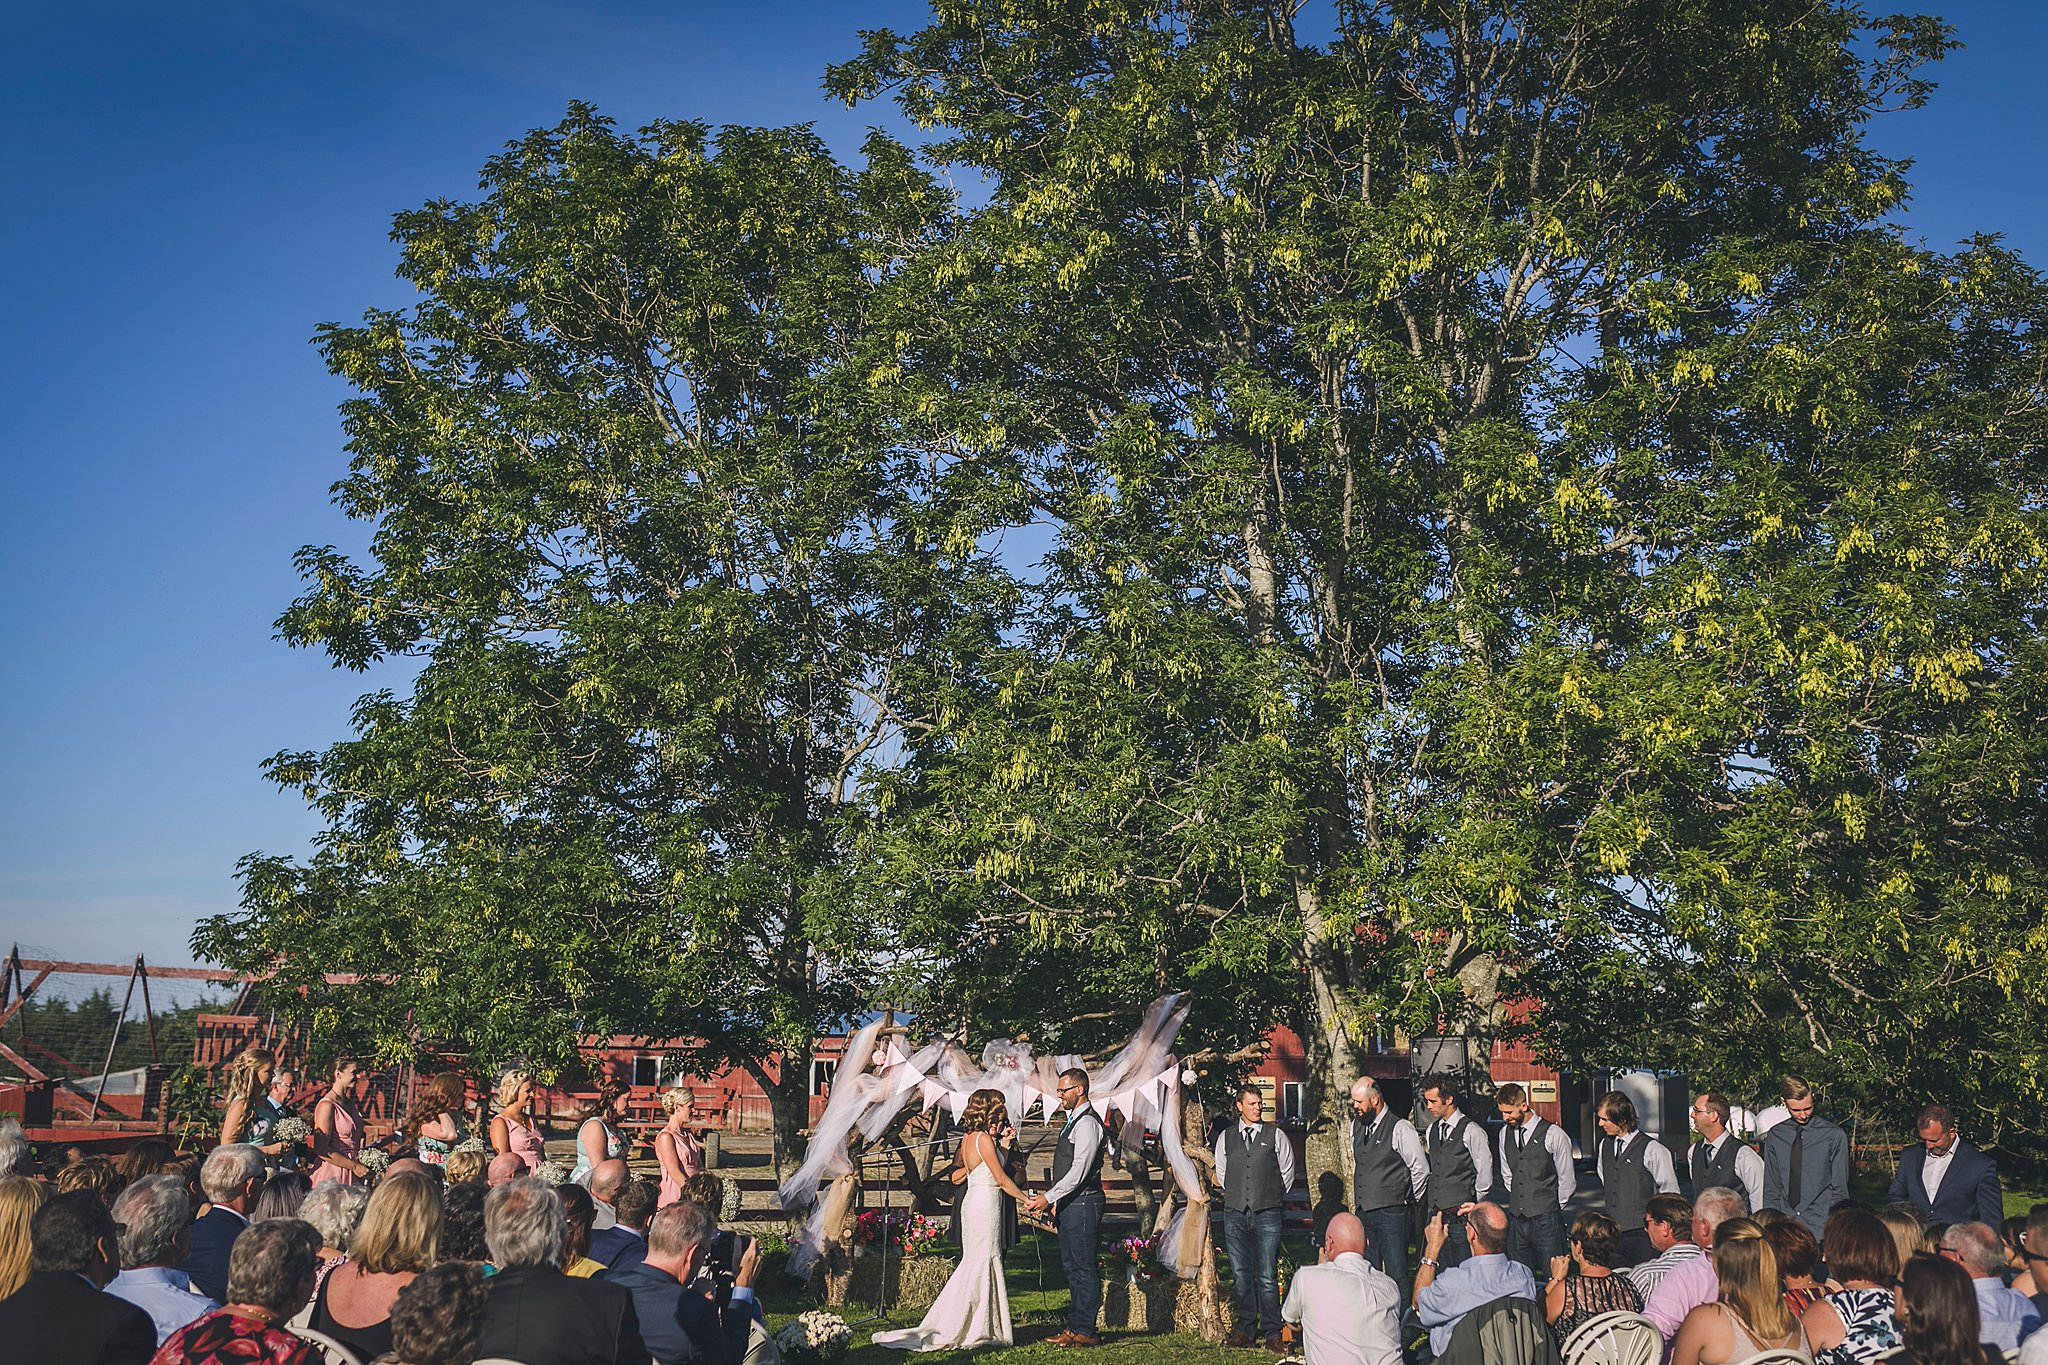 St. John's, Newfoundland Wedding ceremony held at Lester's Farm